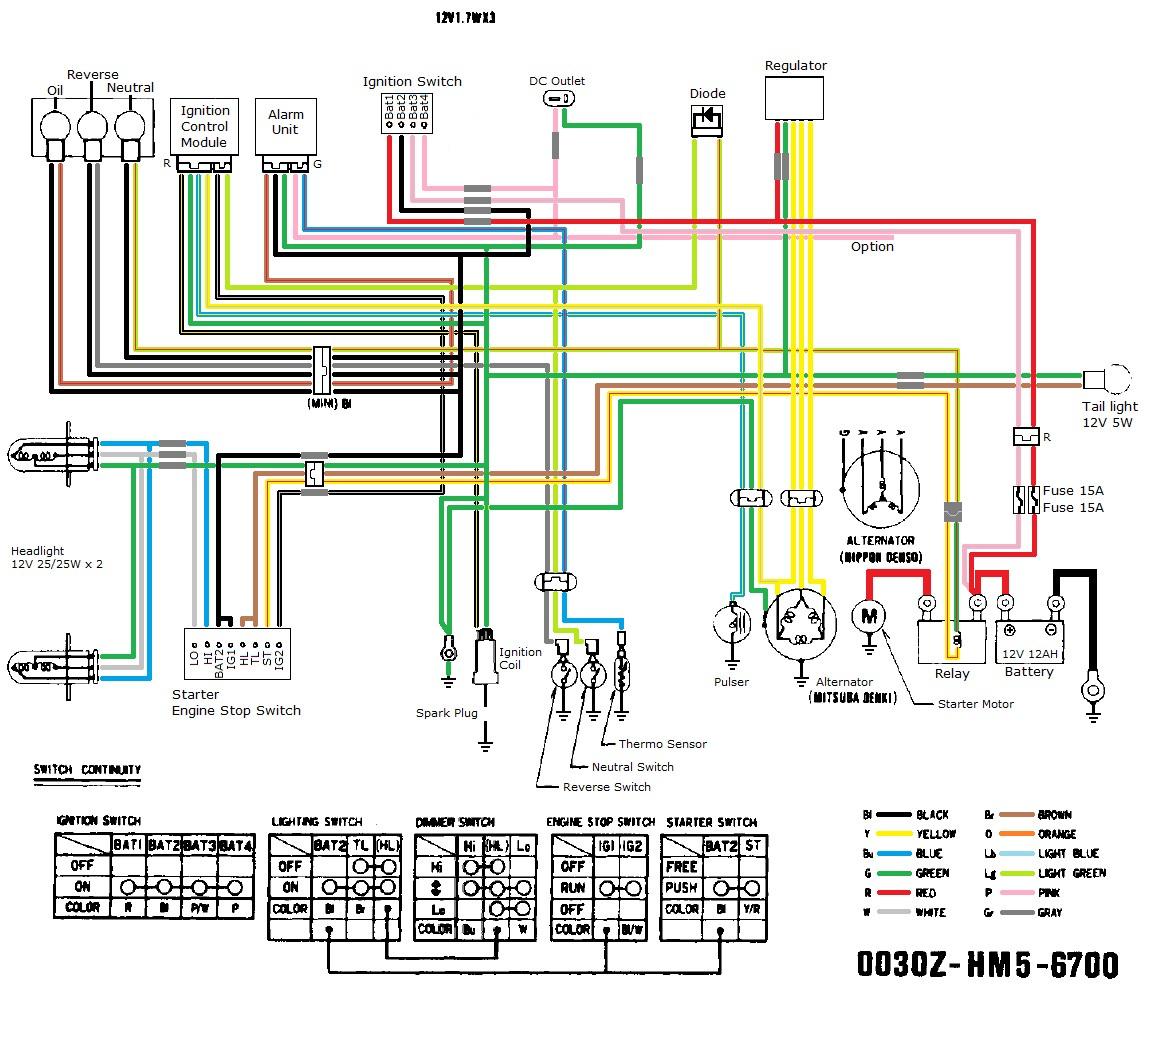 Chinese 110 Atv Wiring Harness | Wiring Diagram - Chinese Atv Wiring Harness Diagram